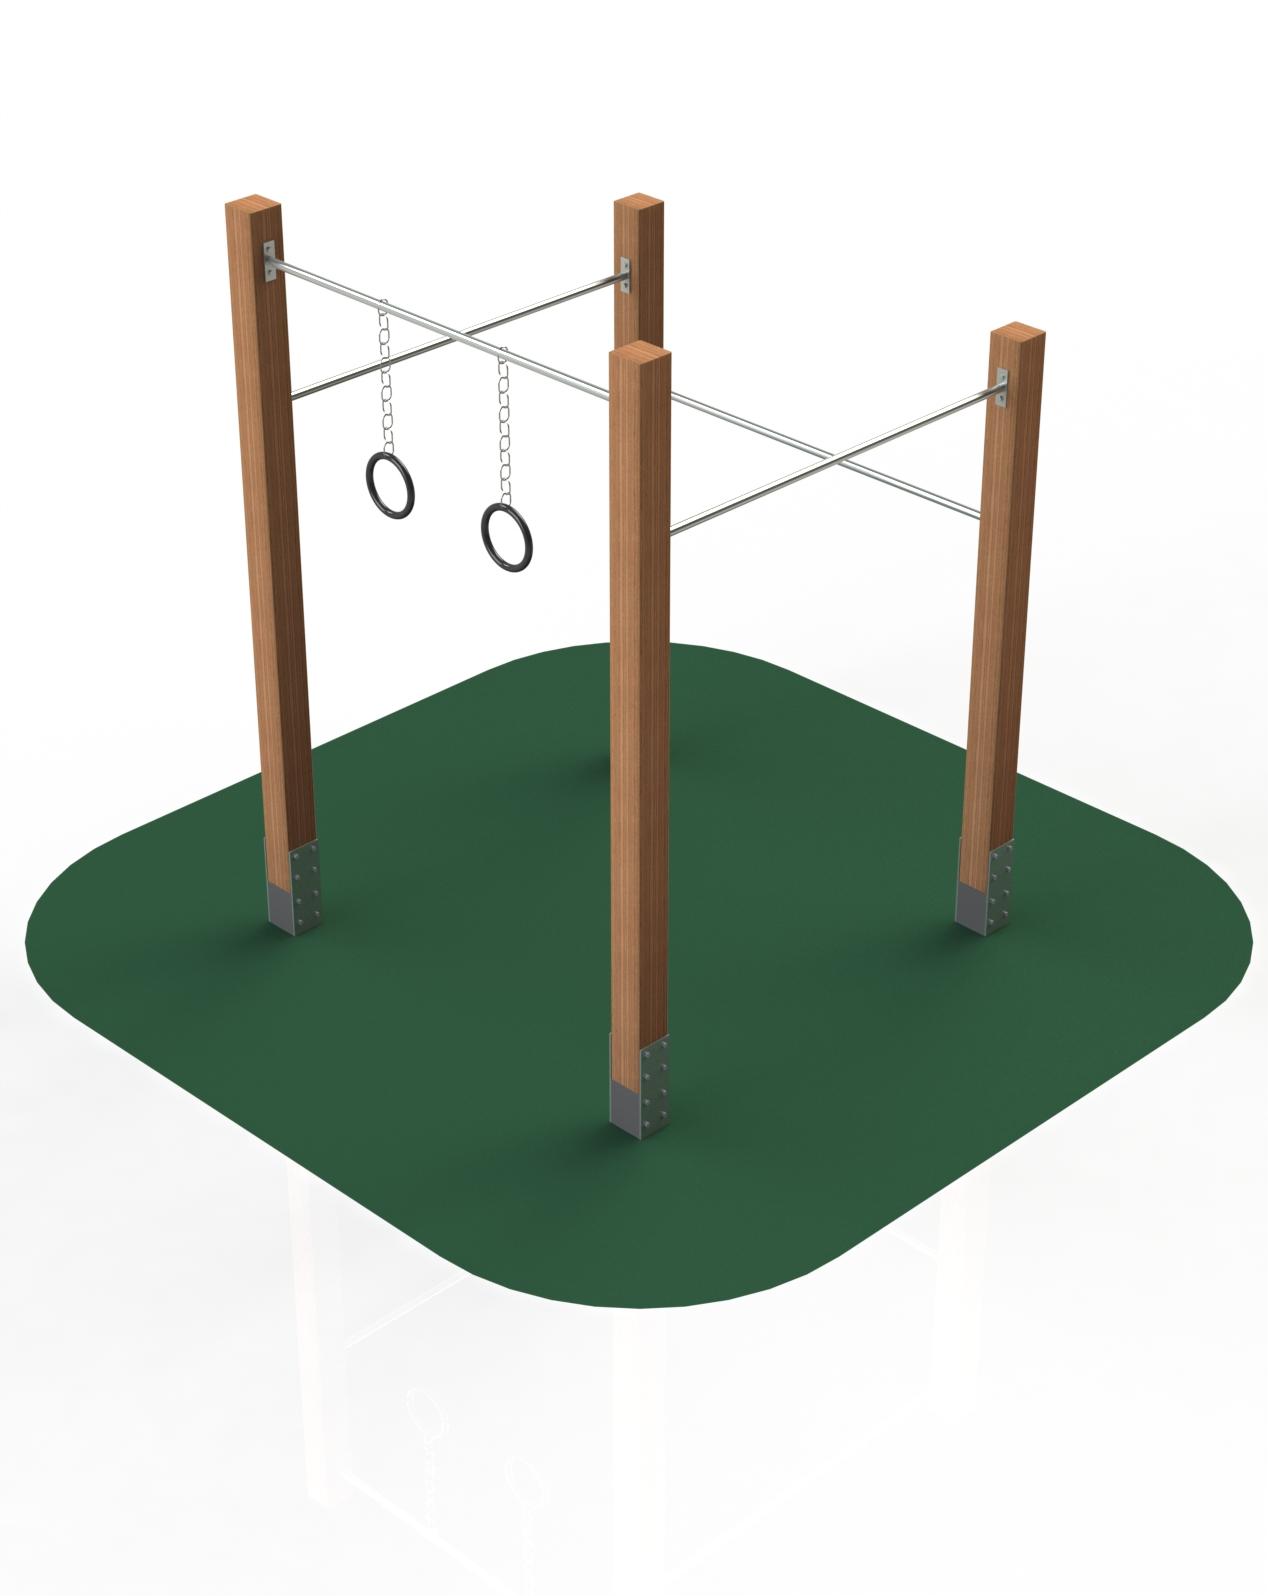 Rods + gymnastic wheels